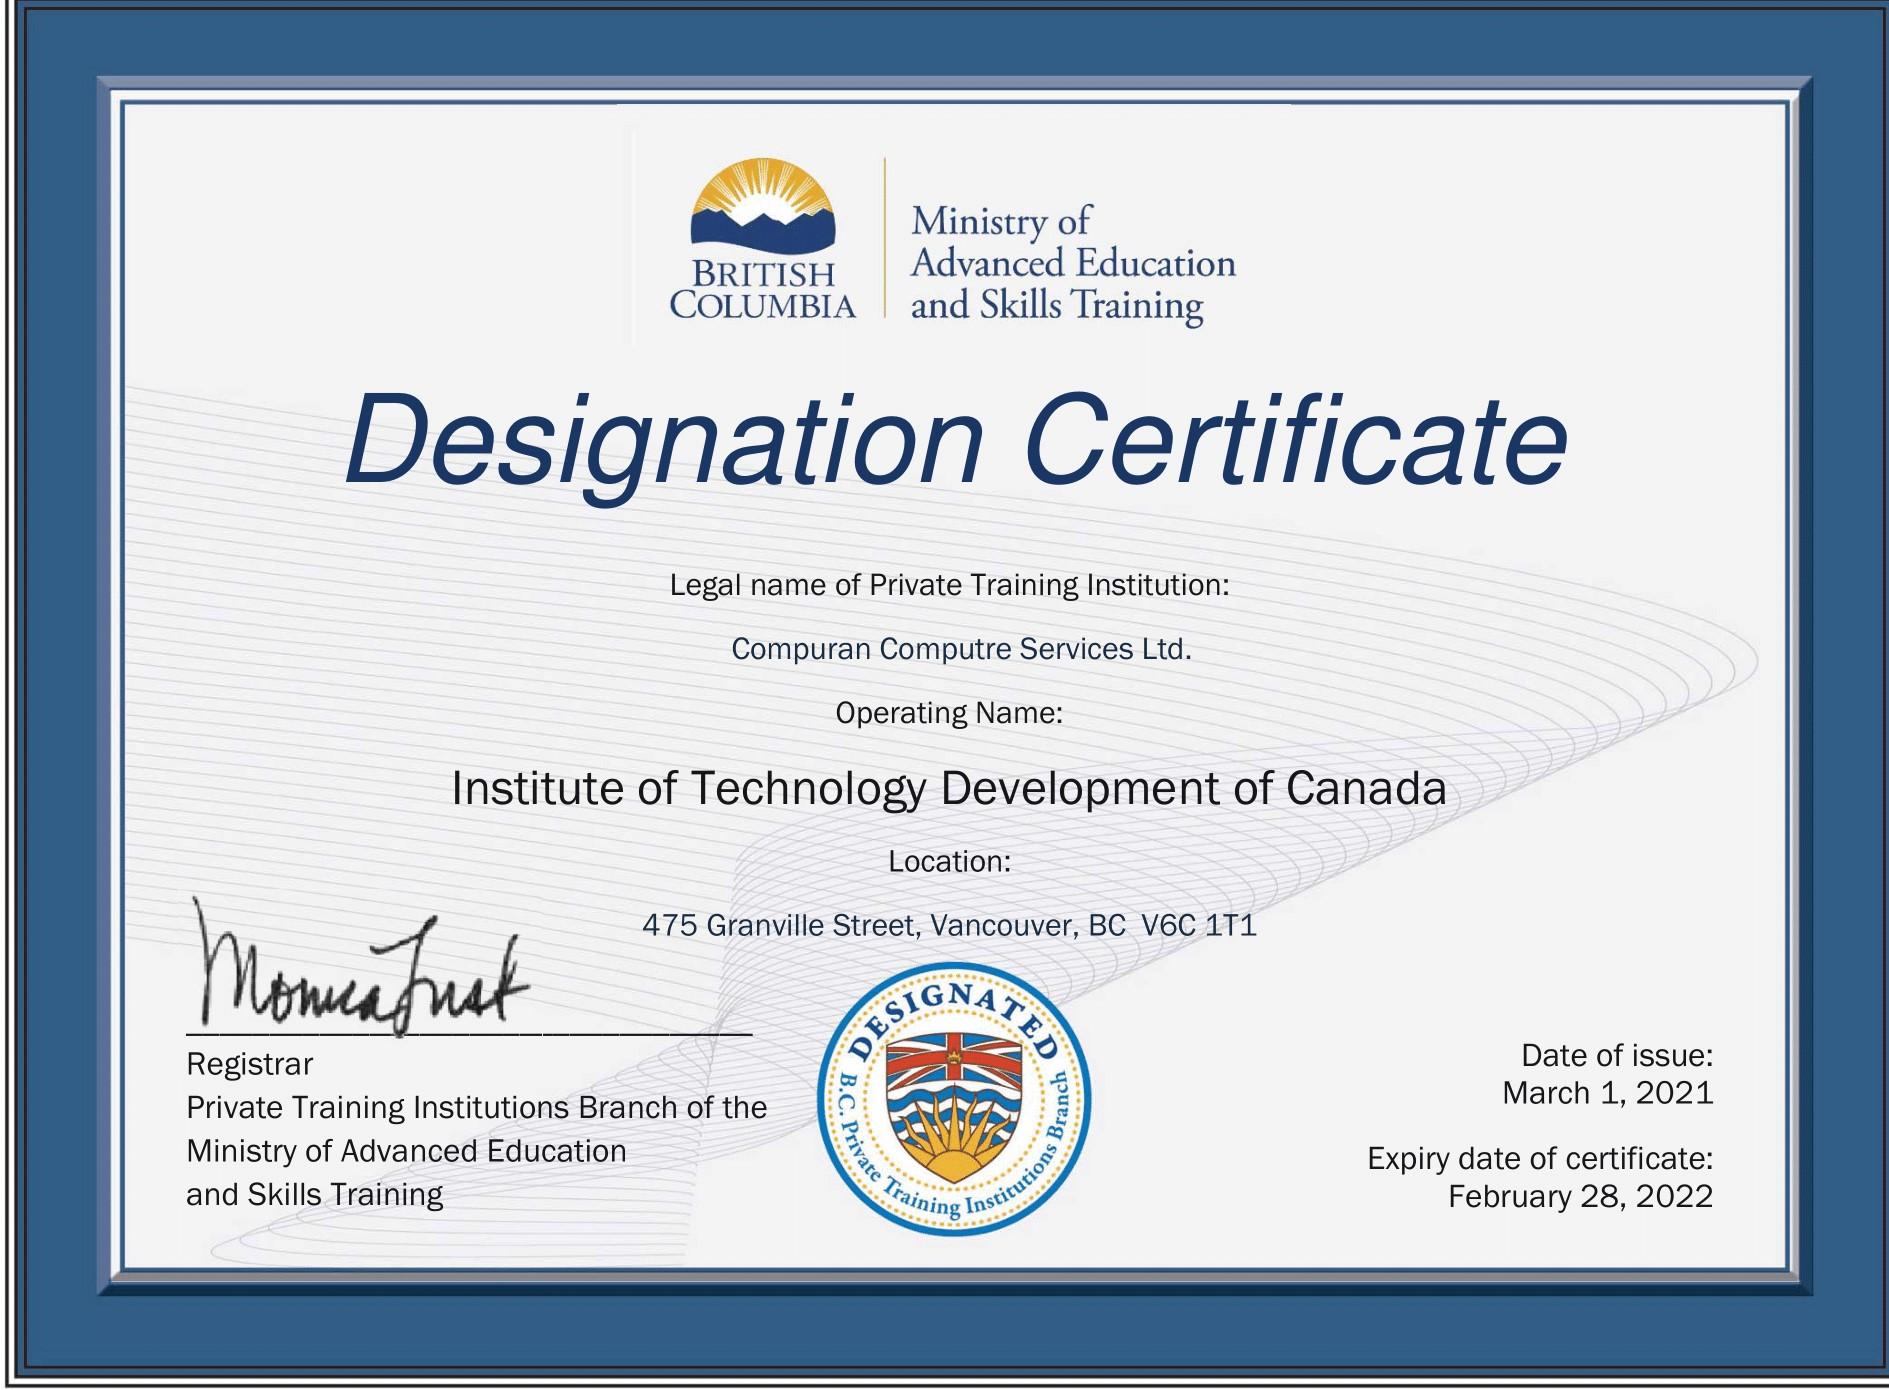 institute of technology - In Canada - ITD Canada - Accreditation Certificate